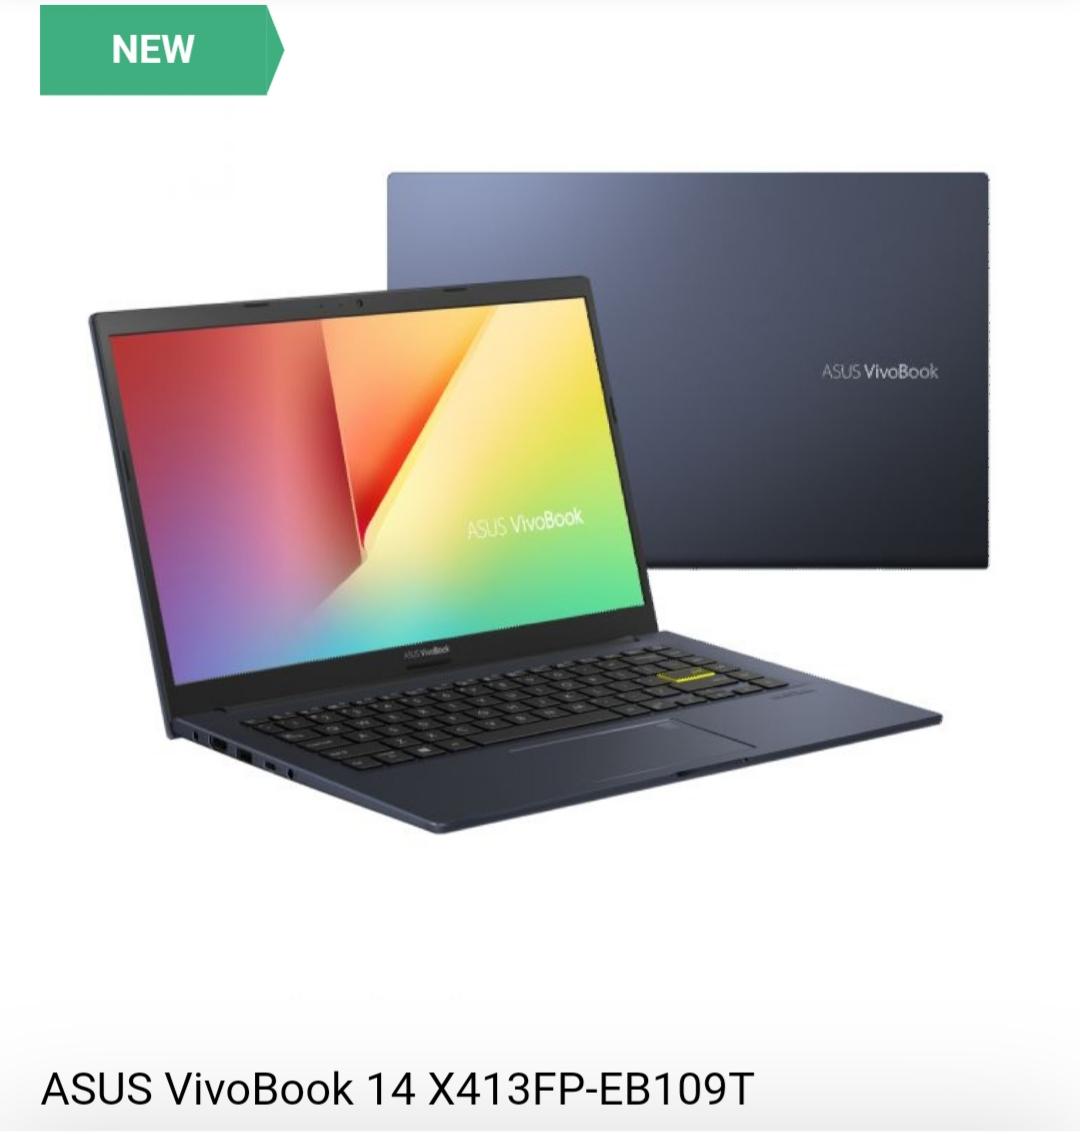 Asus VivoBook 14x413FP Frontview